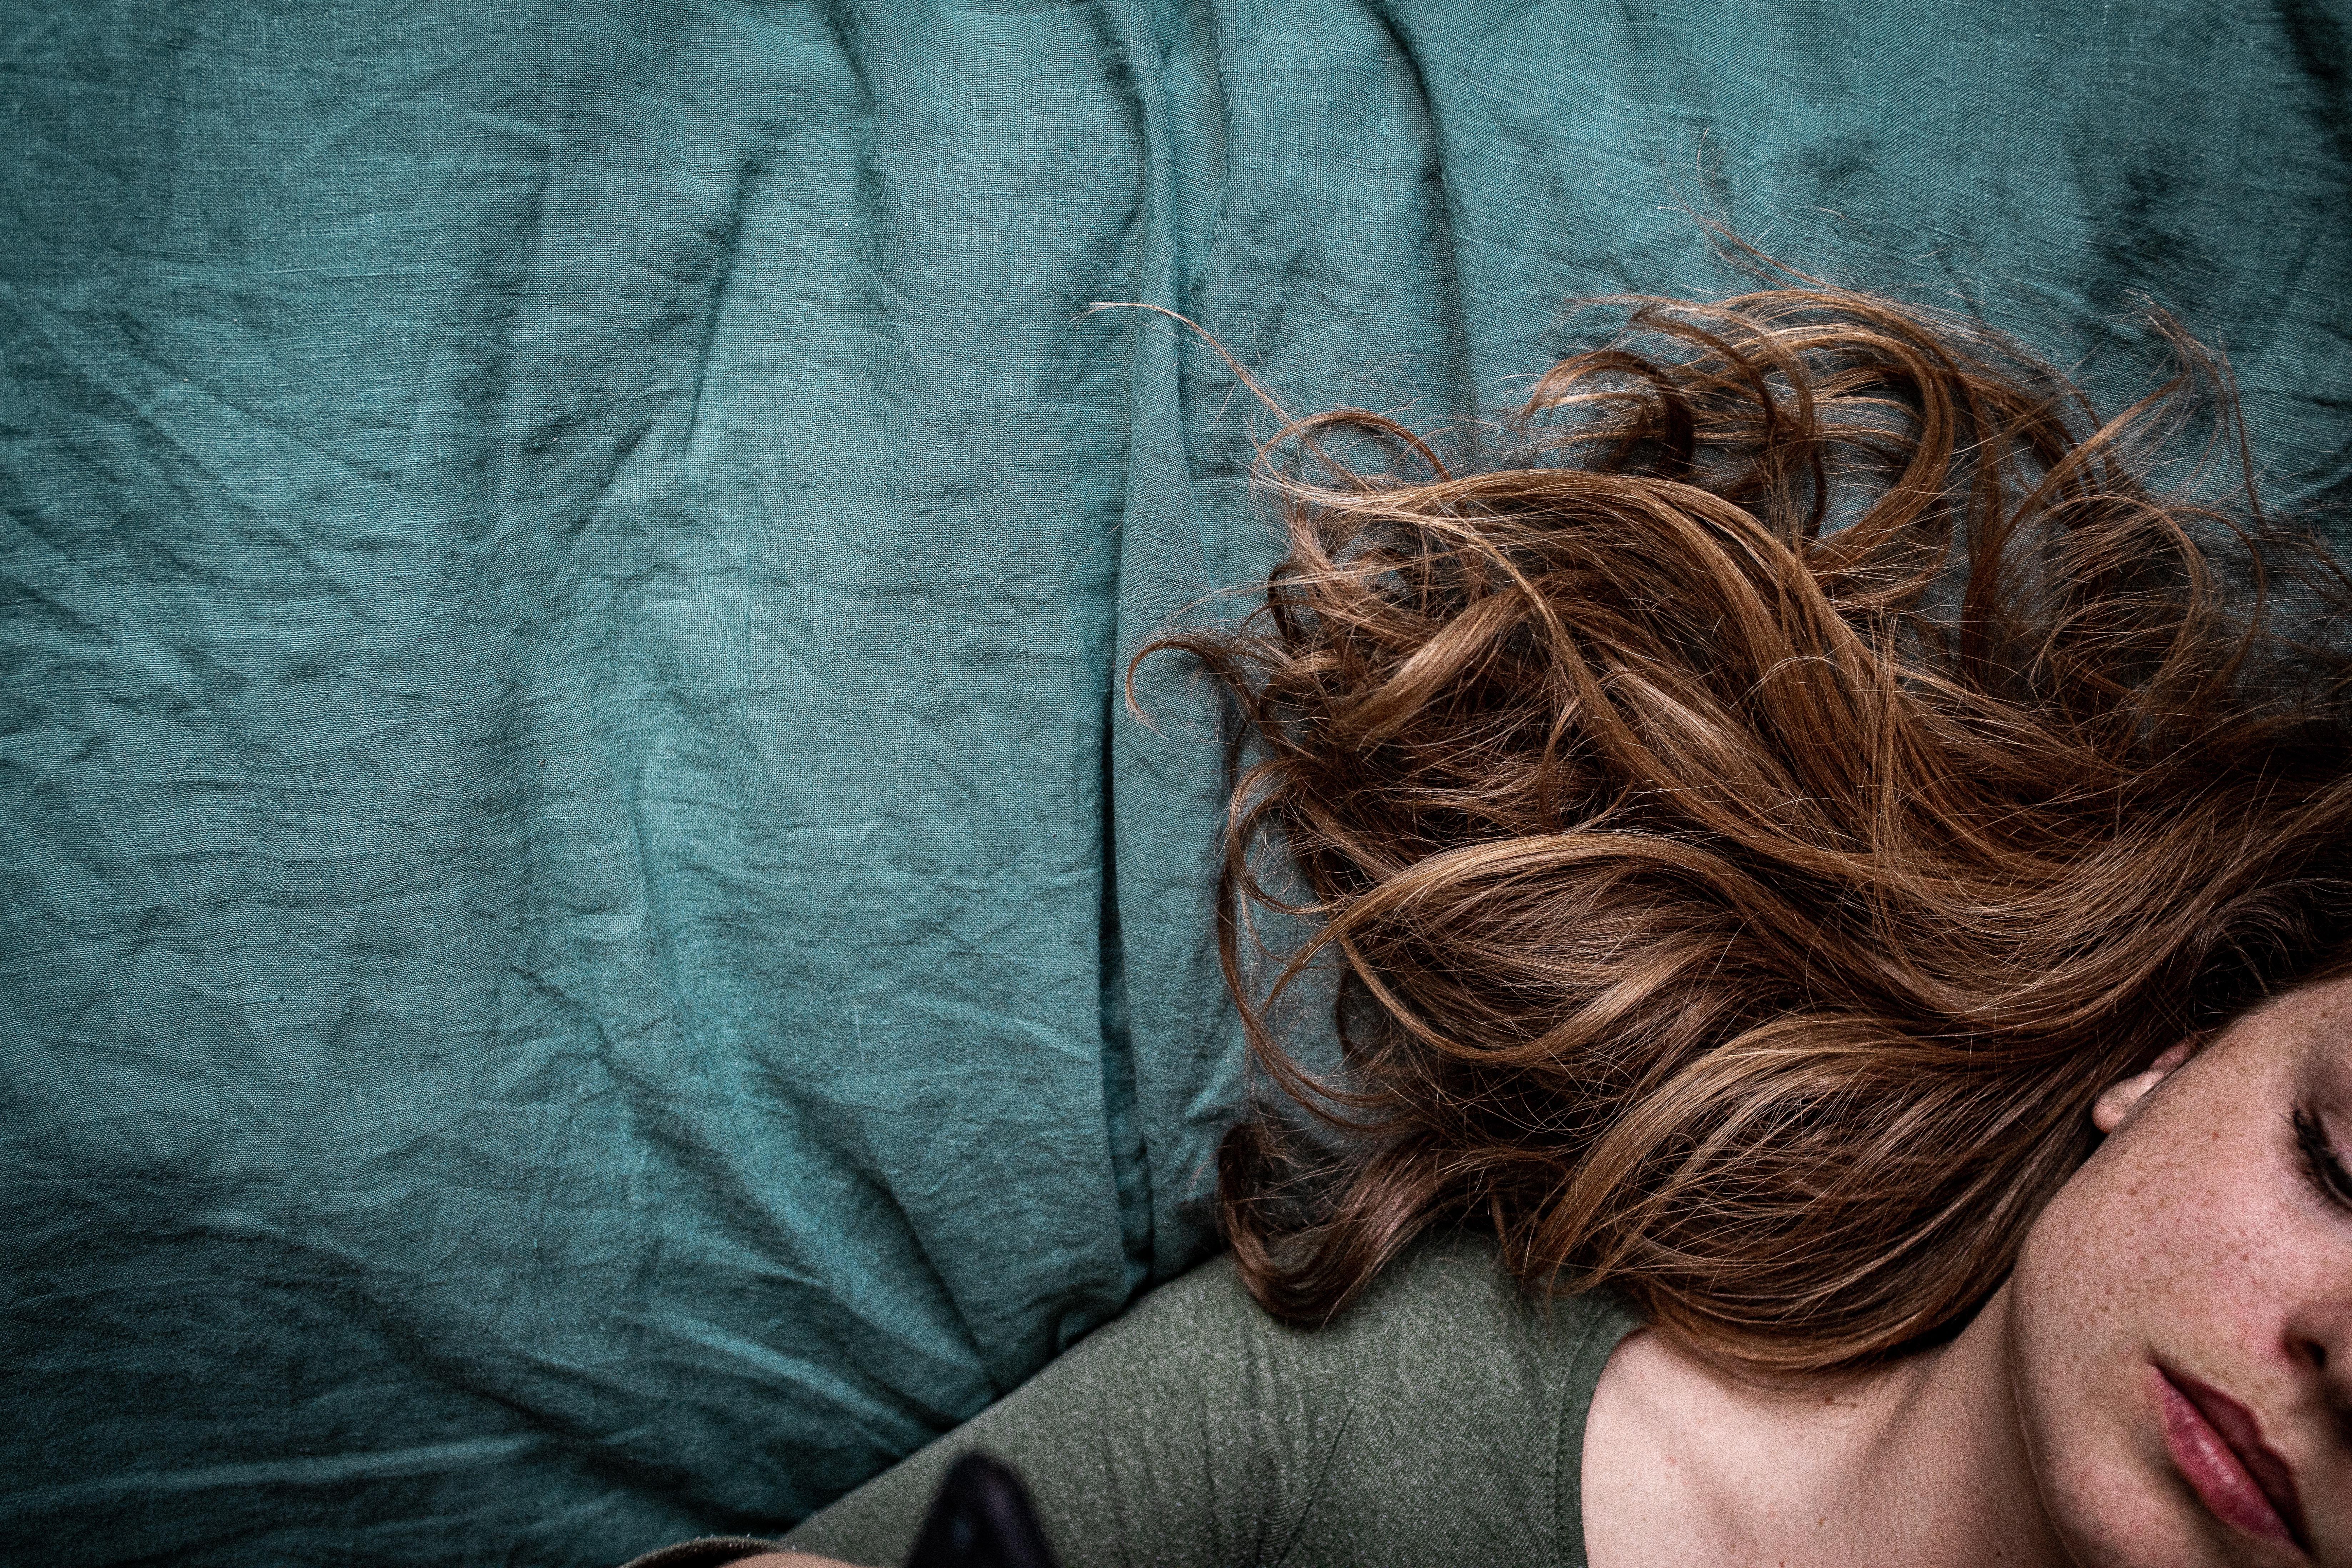 Girl lying on a green linen sheets